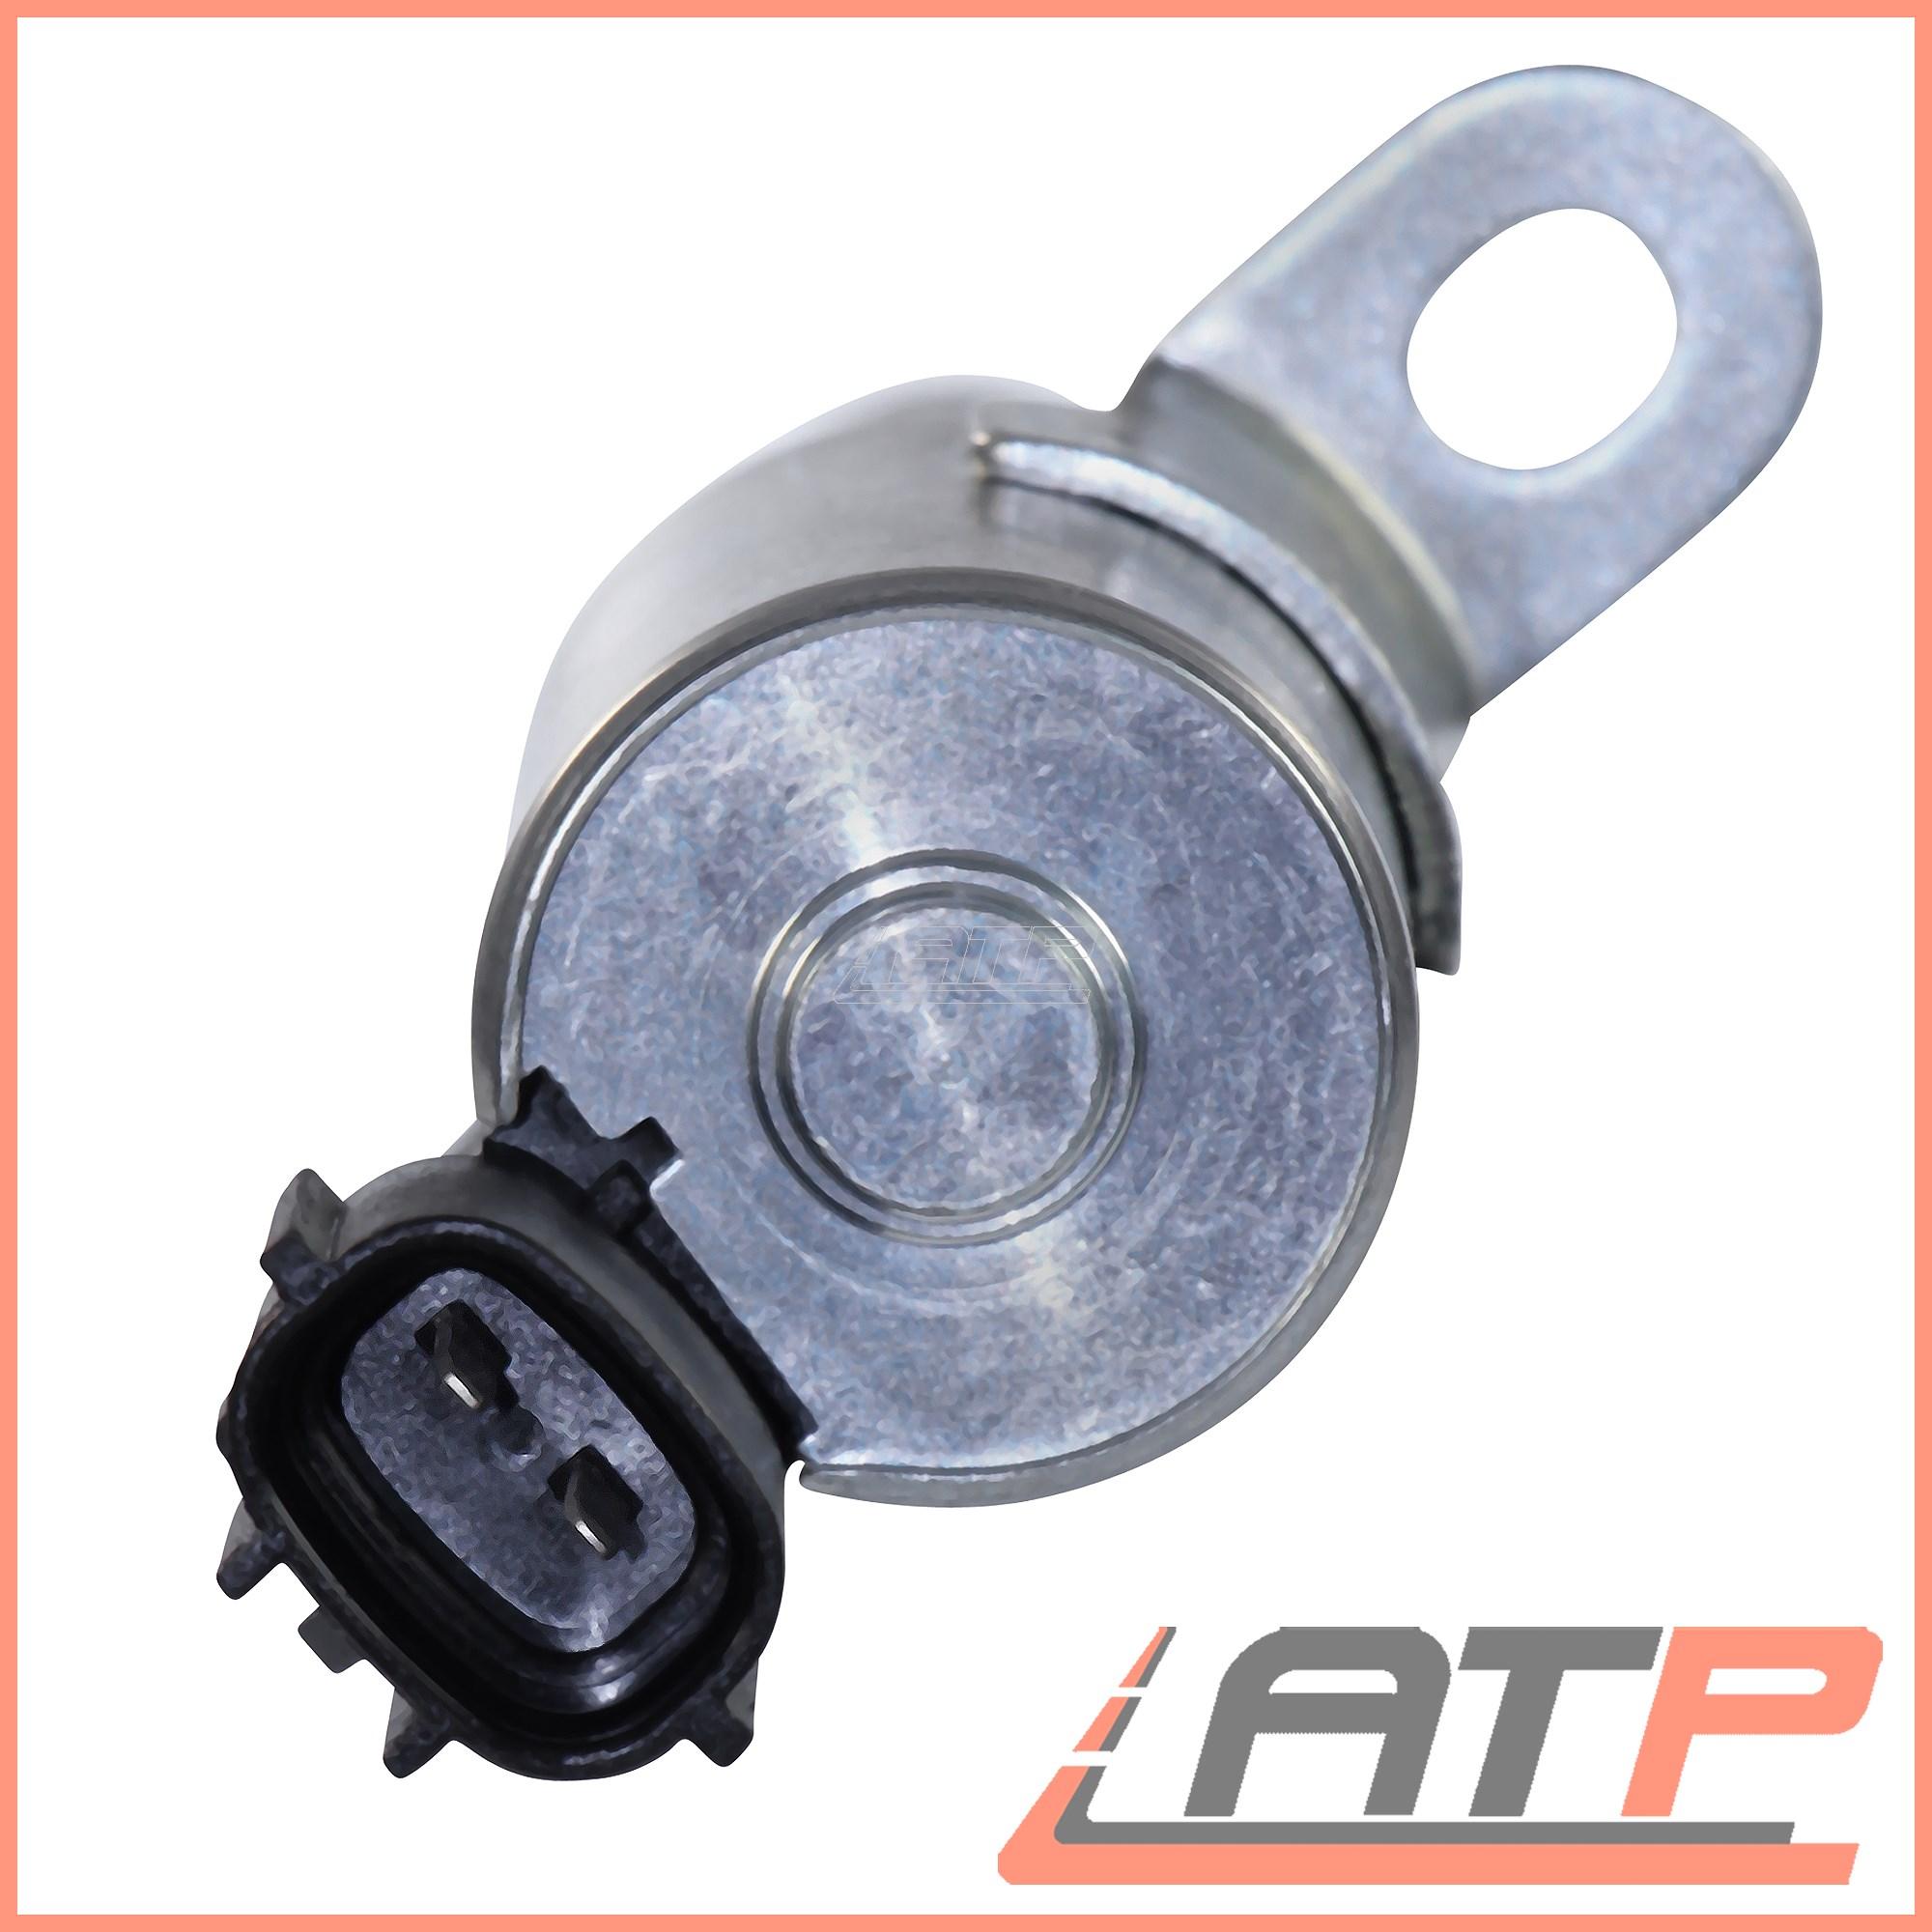 Solenoide-valvula-de-control-de-ajuste-del-arbol-de-levas-1X-Toyota-Avensis-T22-2-0-00-03 miniatura 3